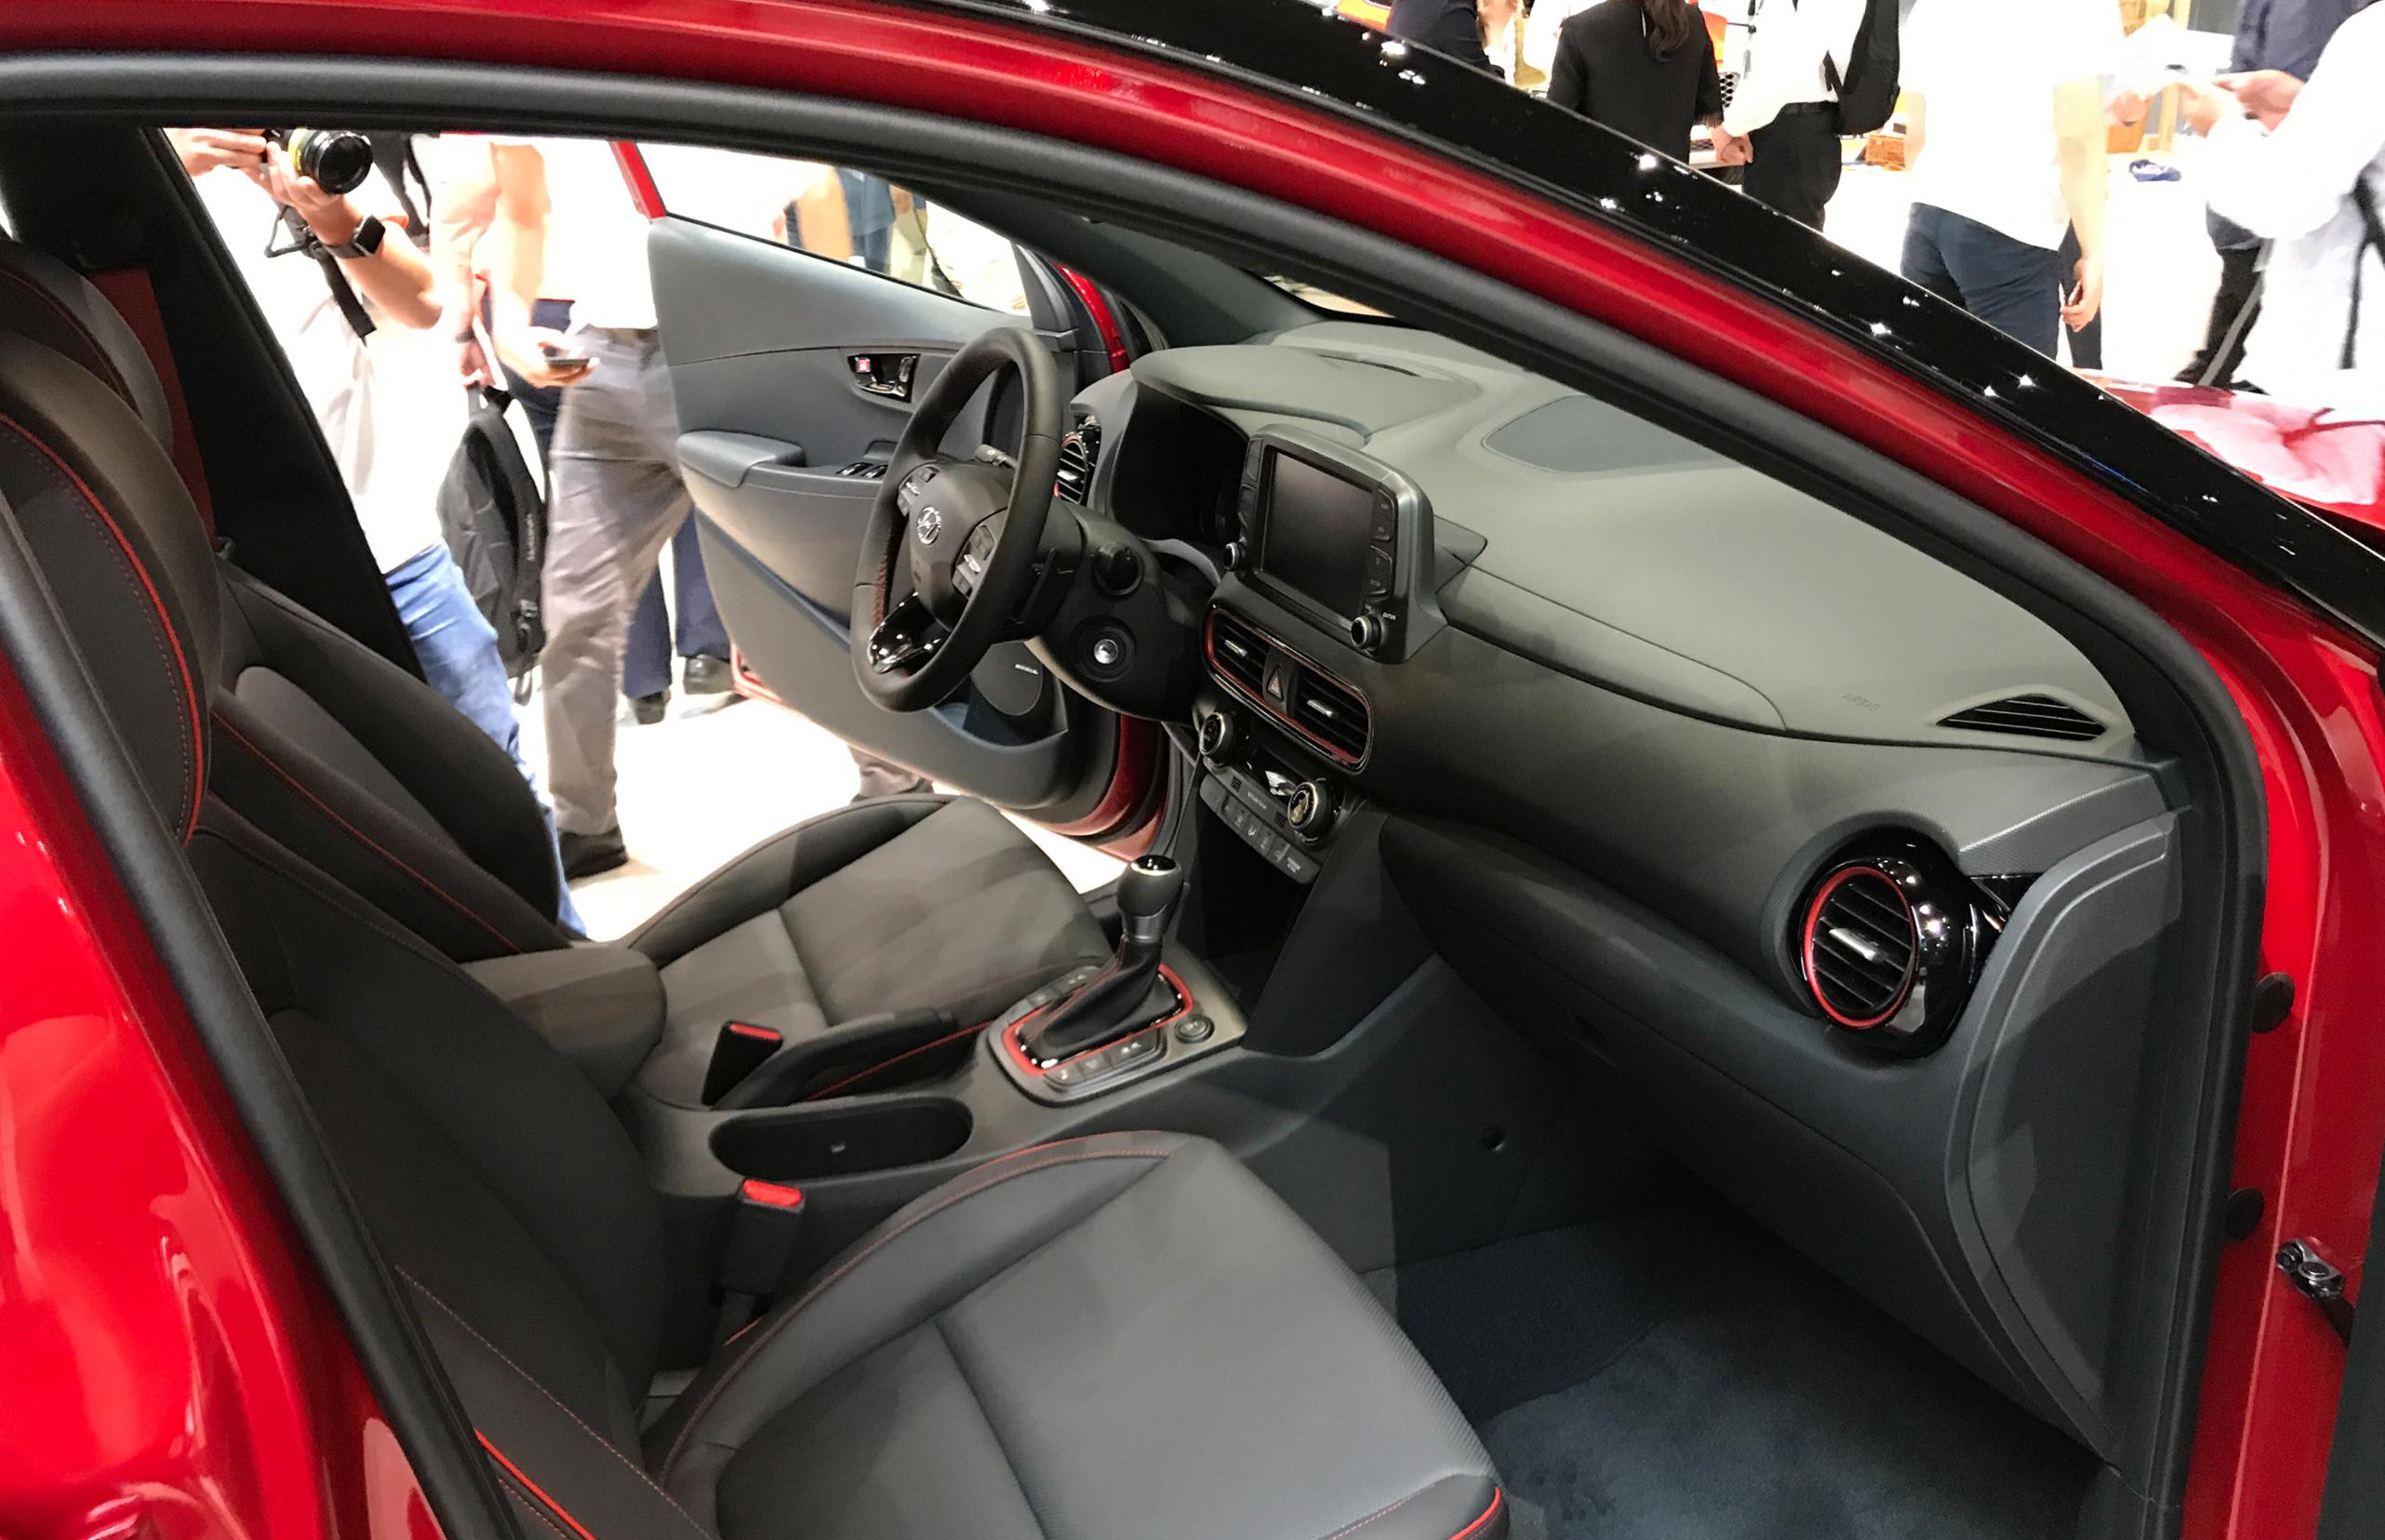 Toyota Camry 2018 Interior >> 2018 Hyundai Kona review: Quick drive | CarAdvice